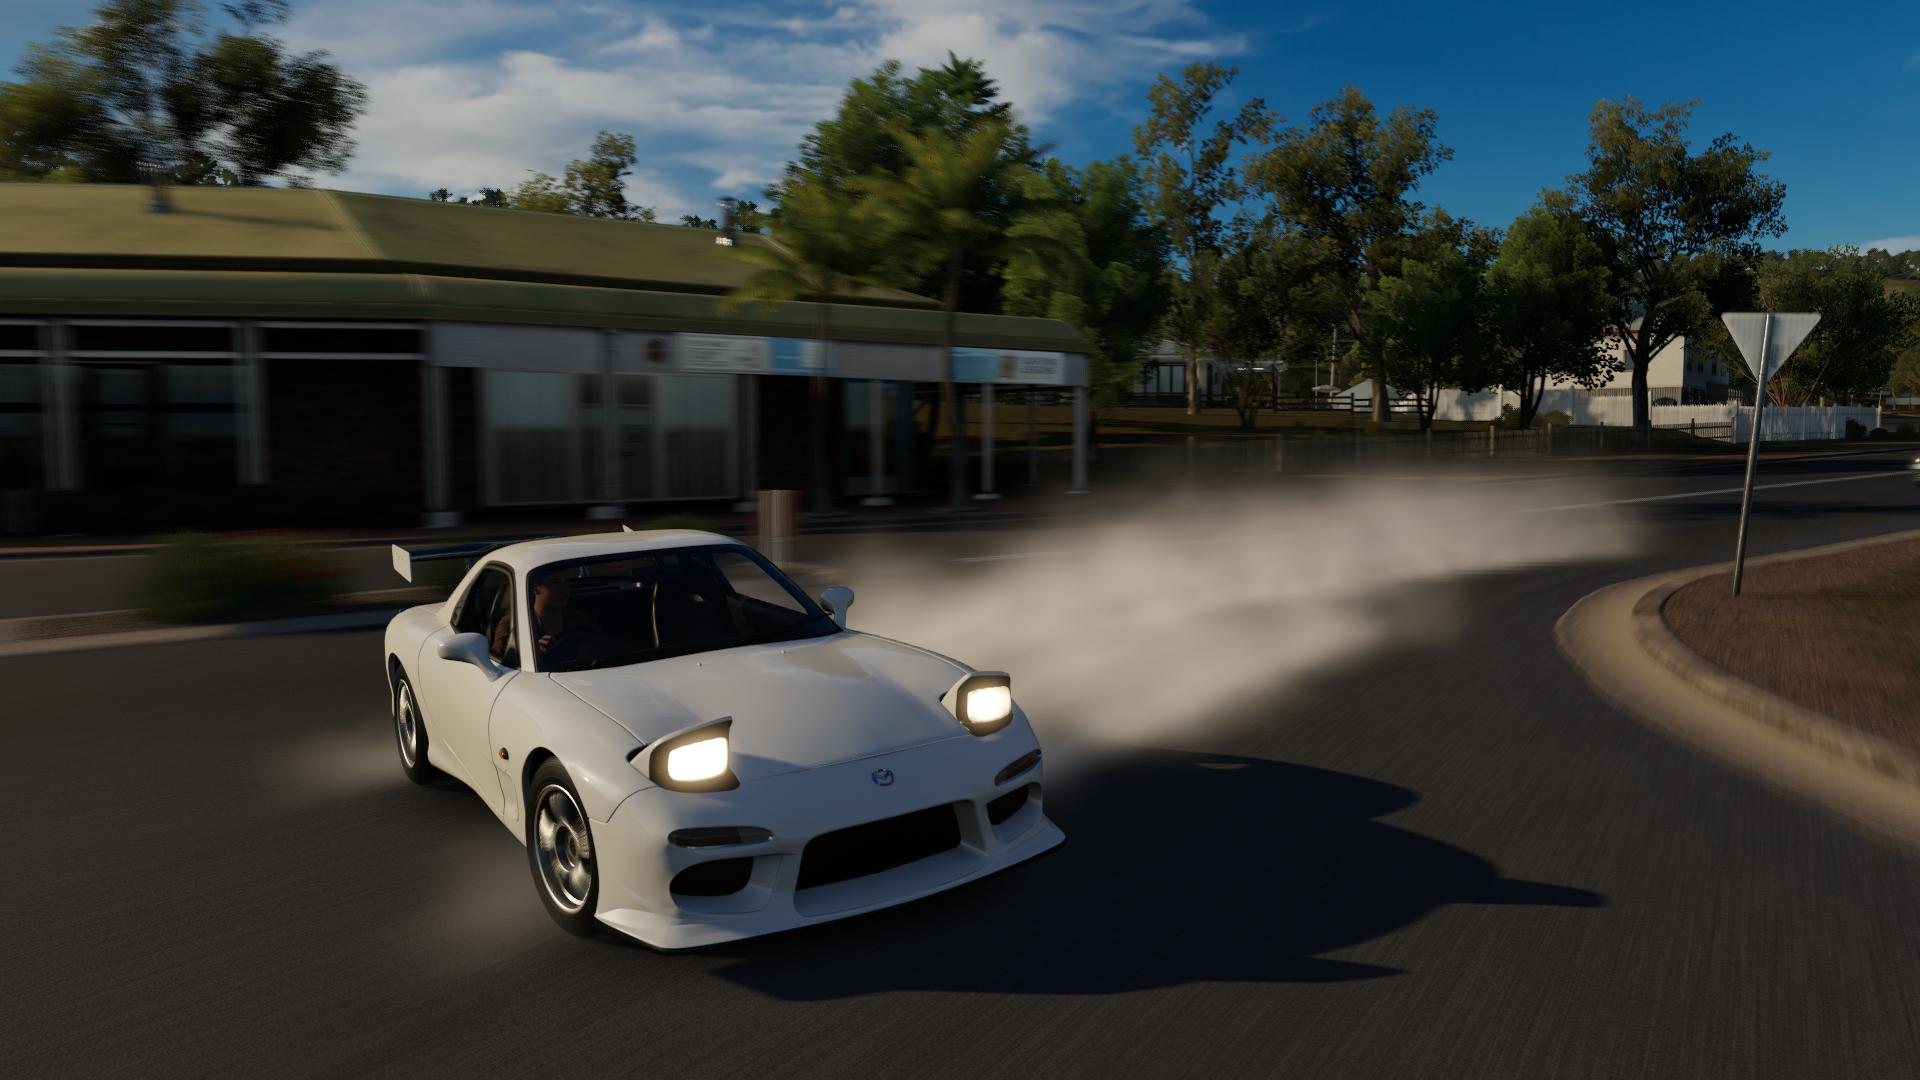 Forza Horizon 4 Crack Status | CrackWatch